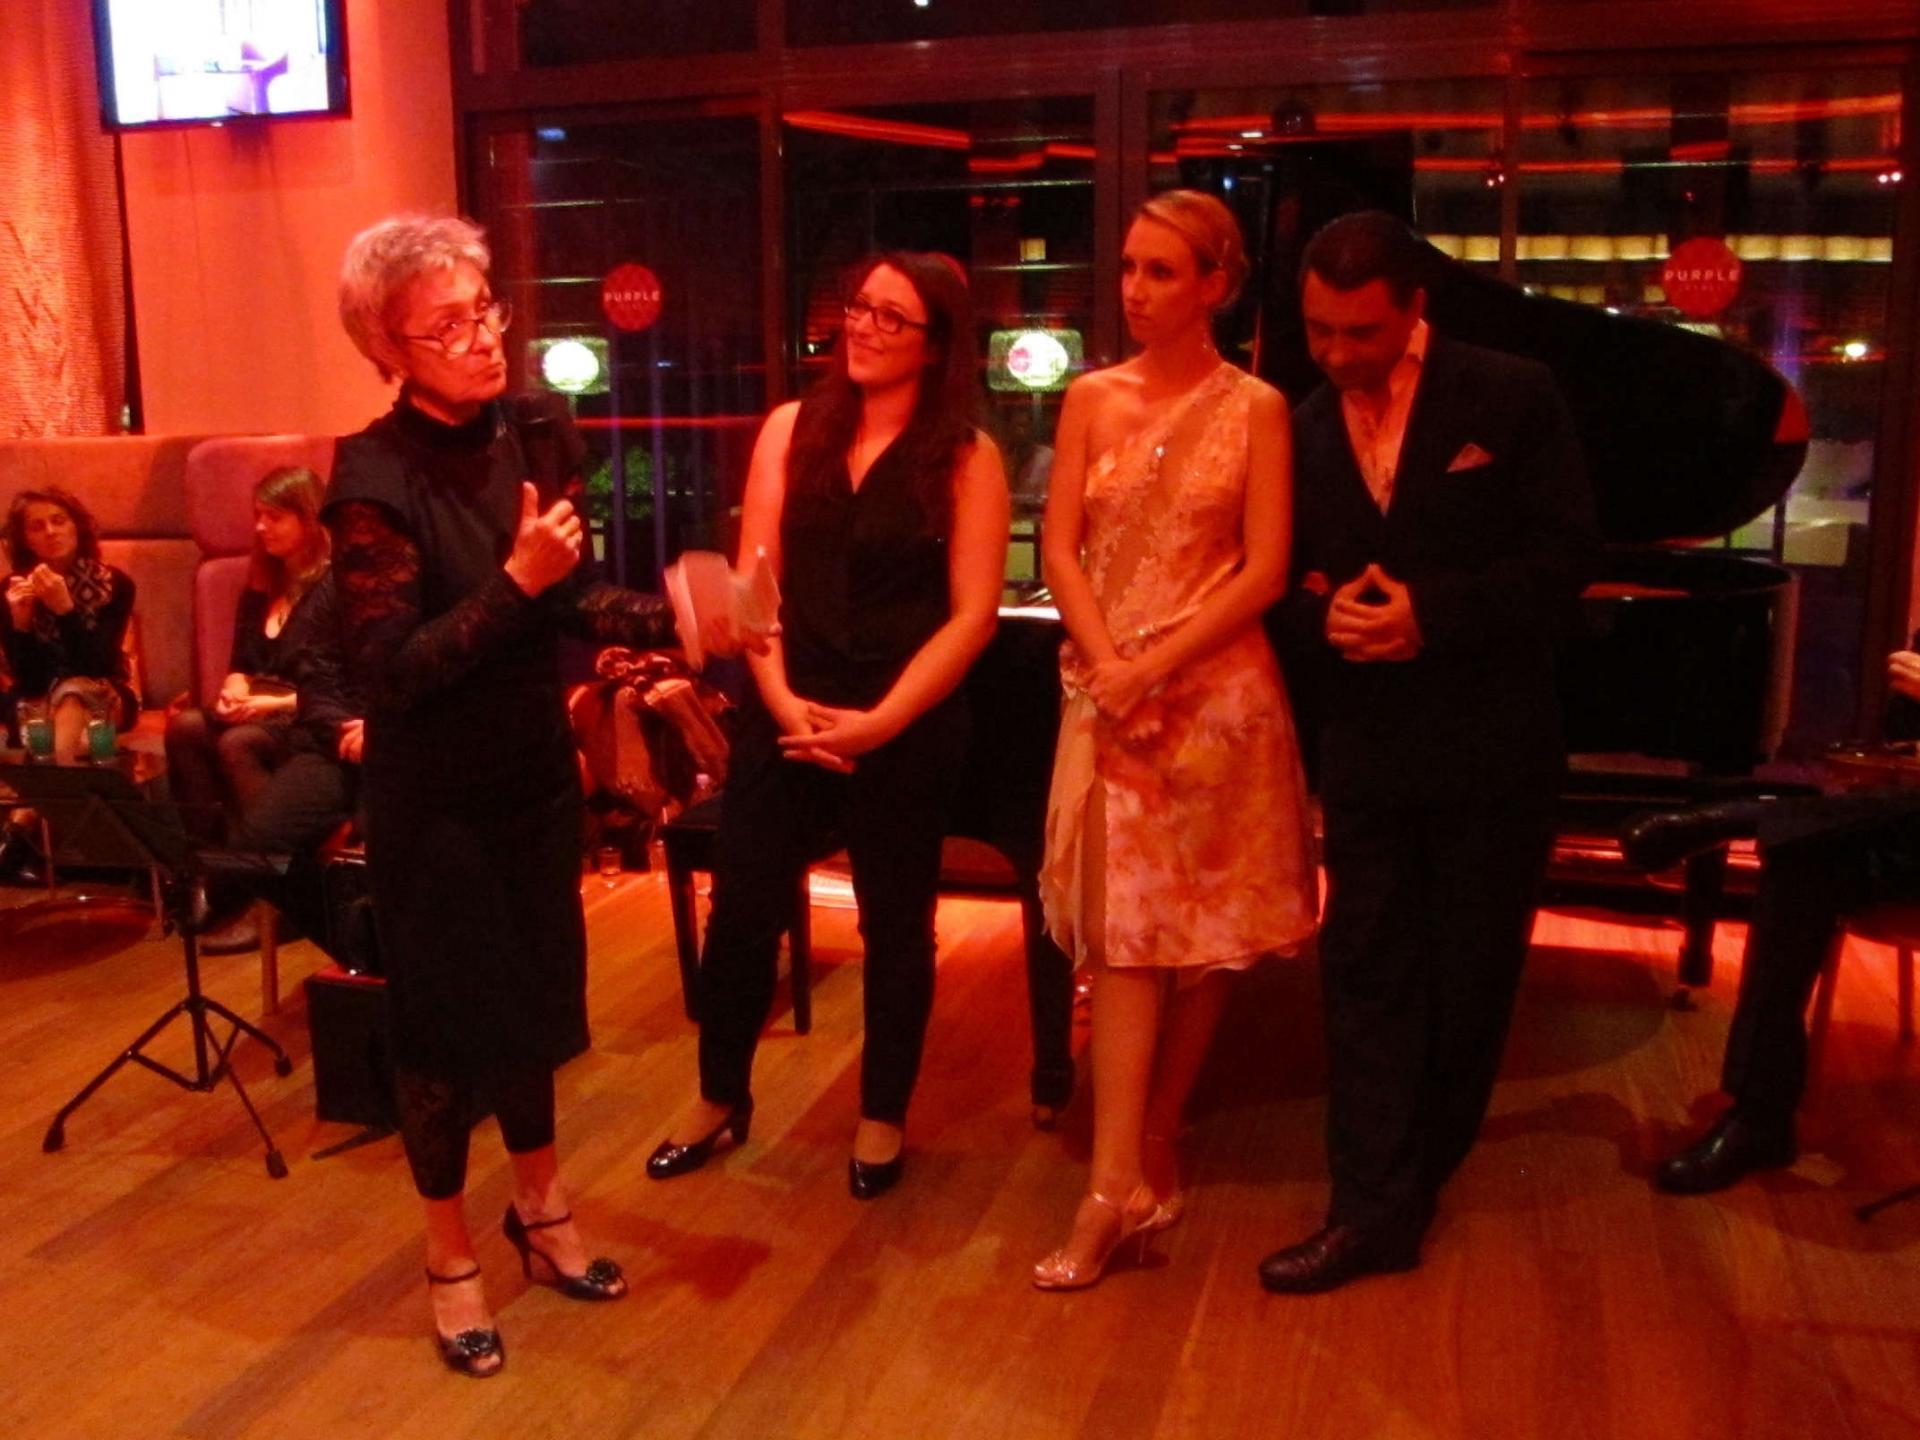 Martine Régnier (Tangolino), Emilie Couturier, Isabelle et Bruno Yniesta (danse)